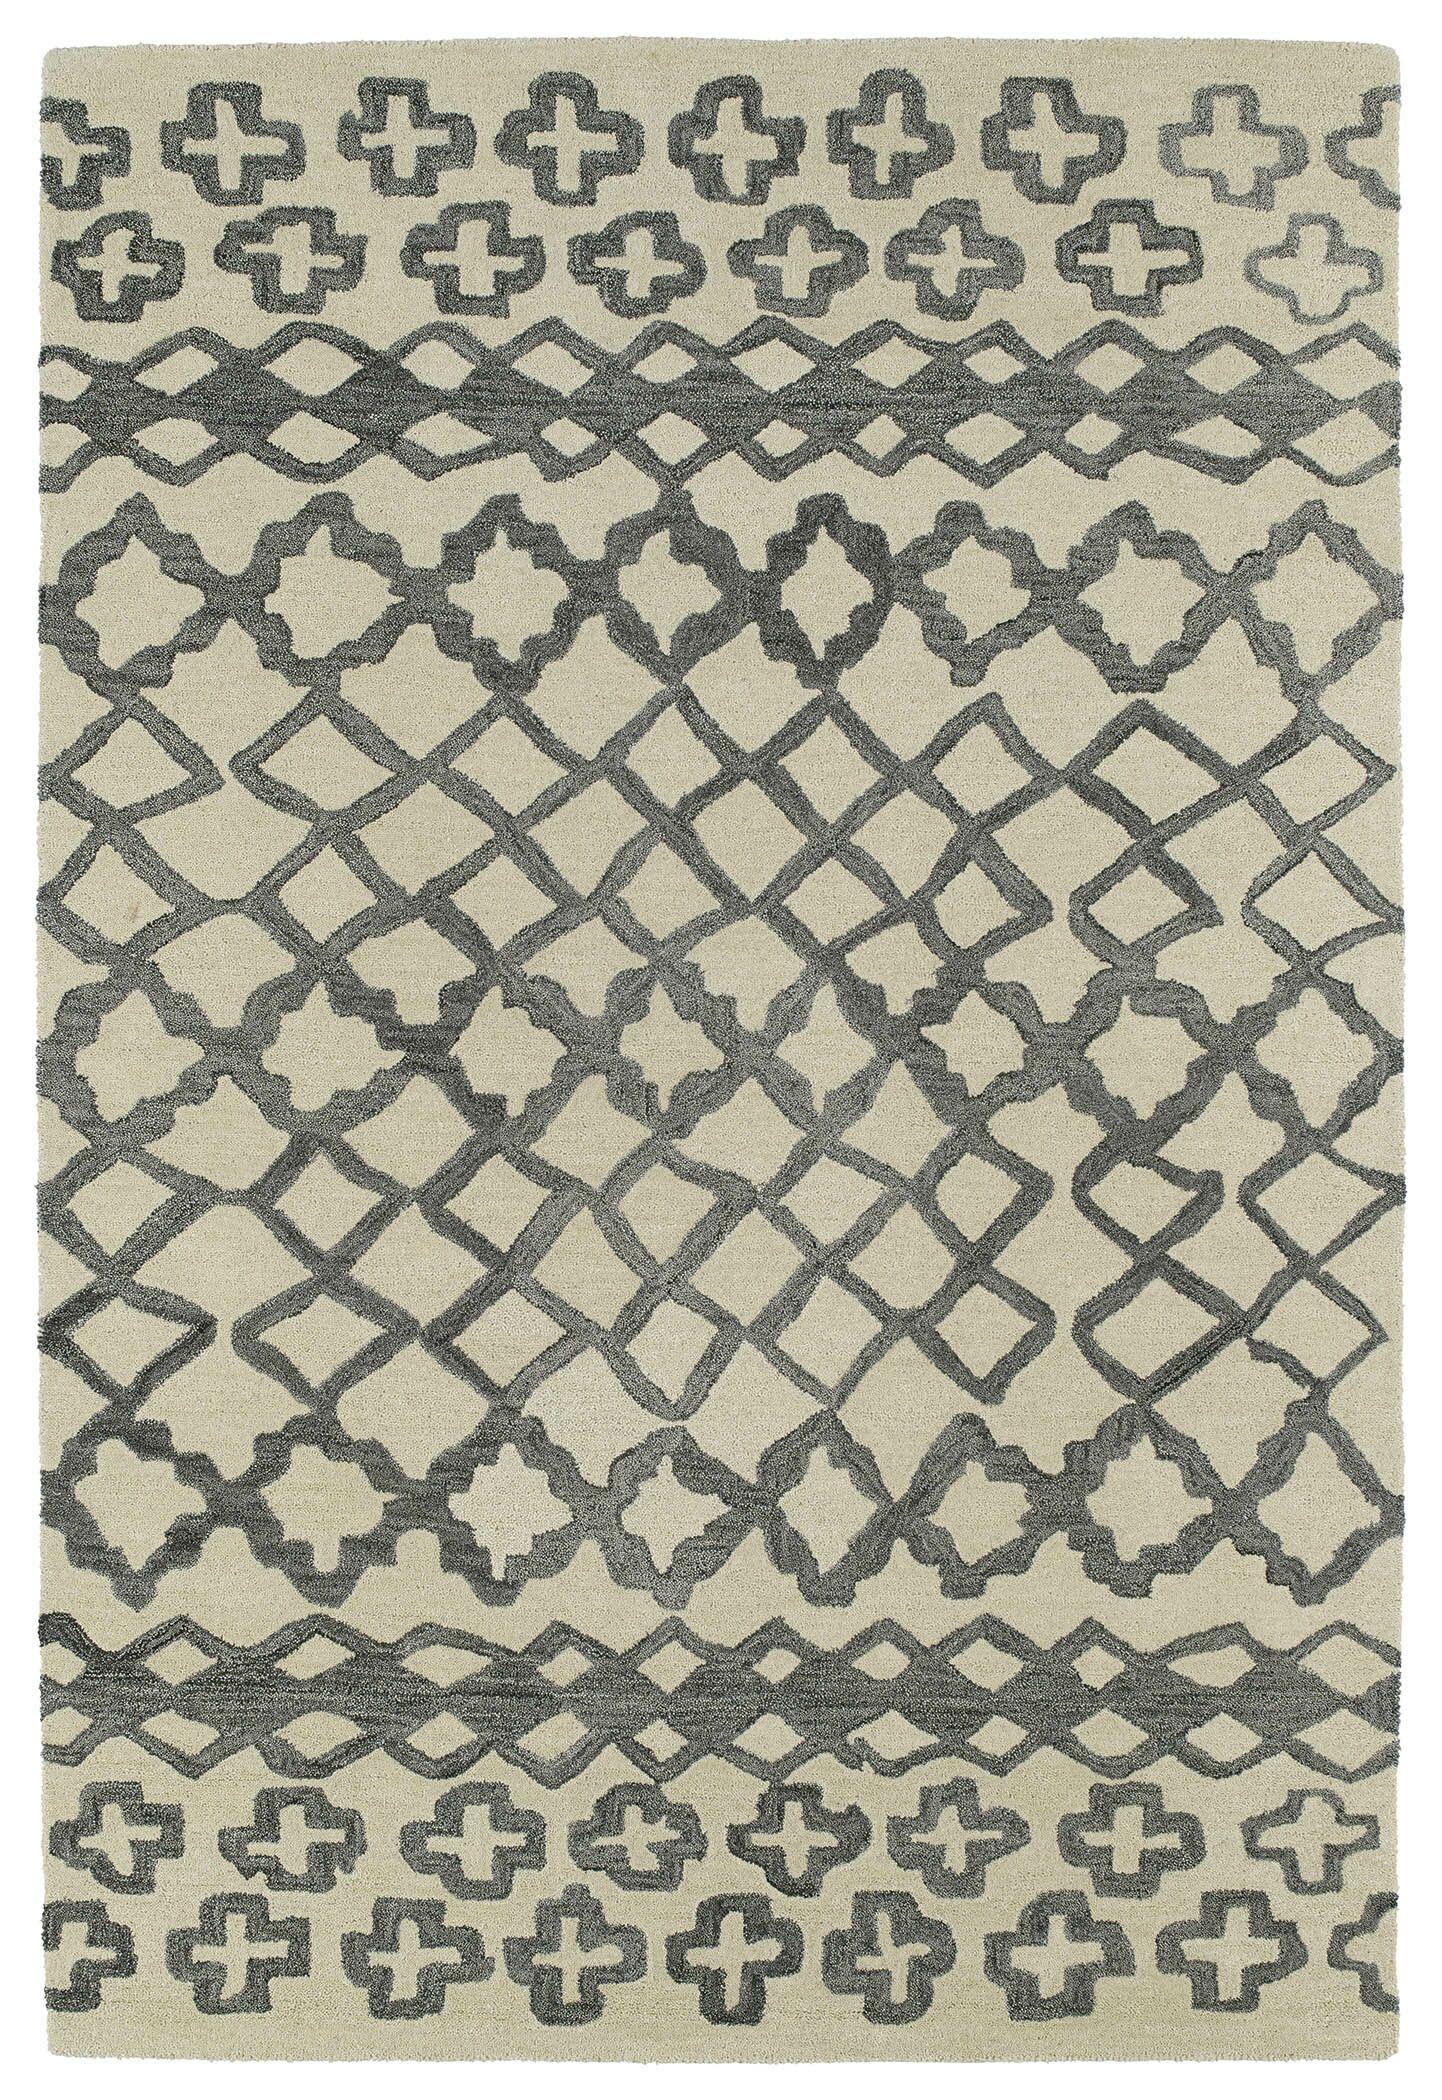 Zack Gray Geometric Area Rug Rug Size: Rectangle 5' x 8'